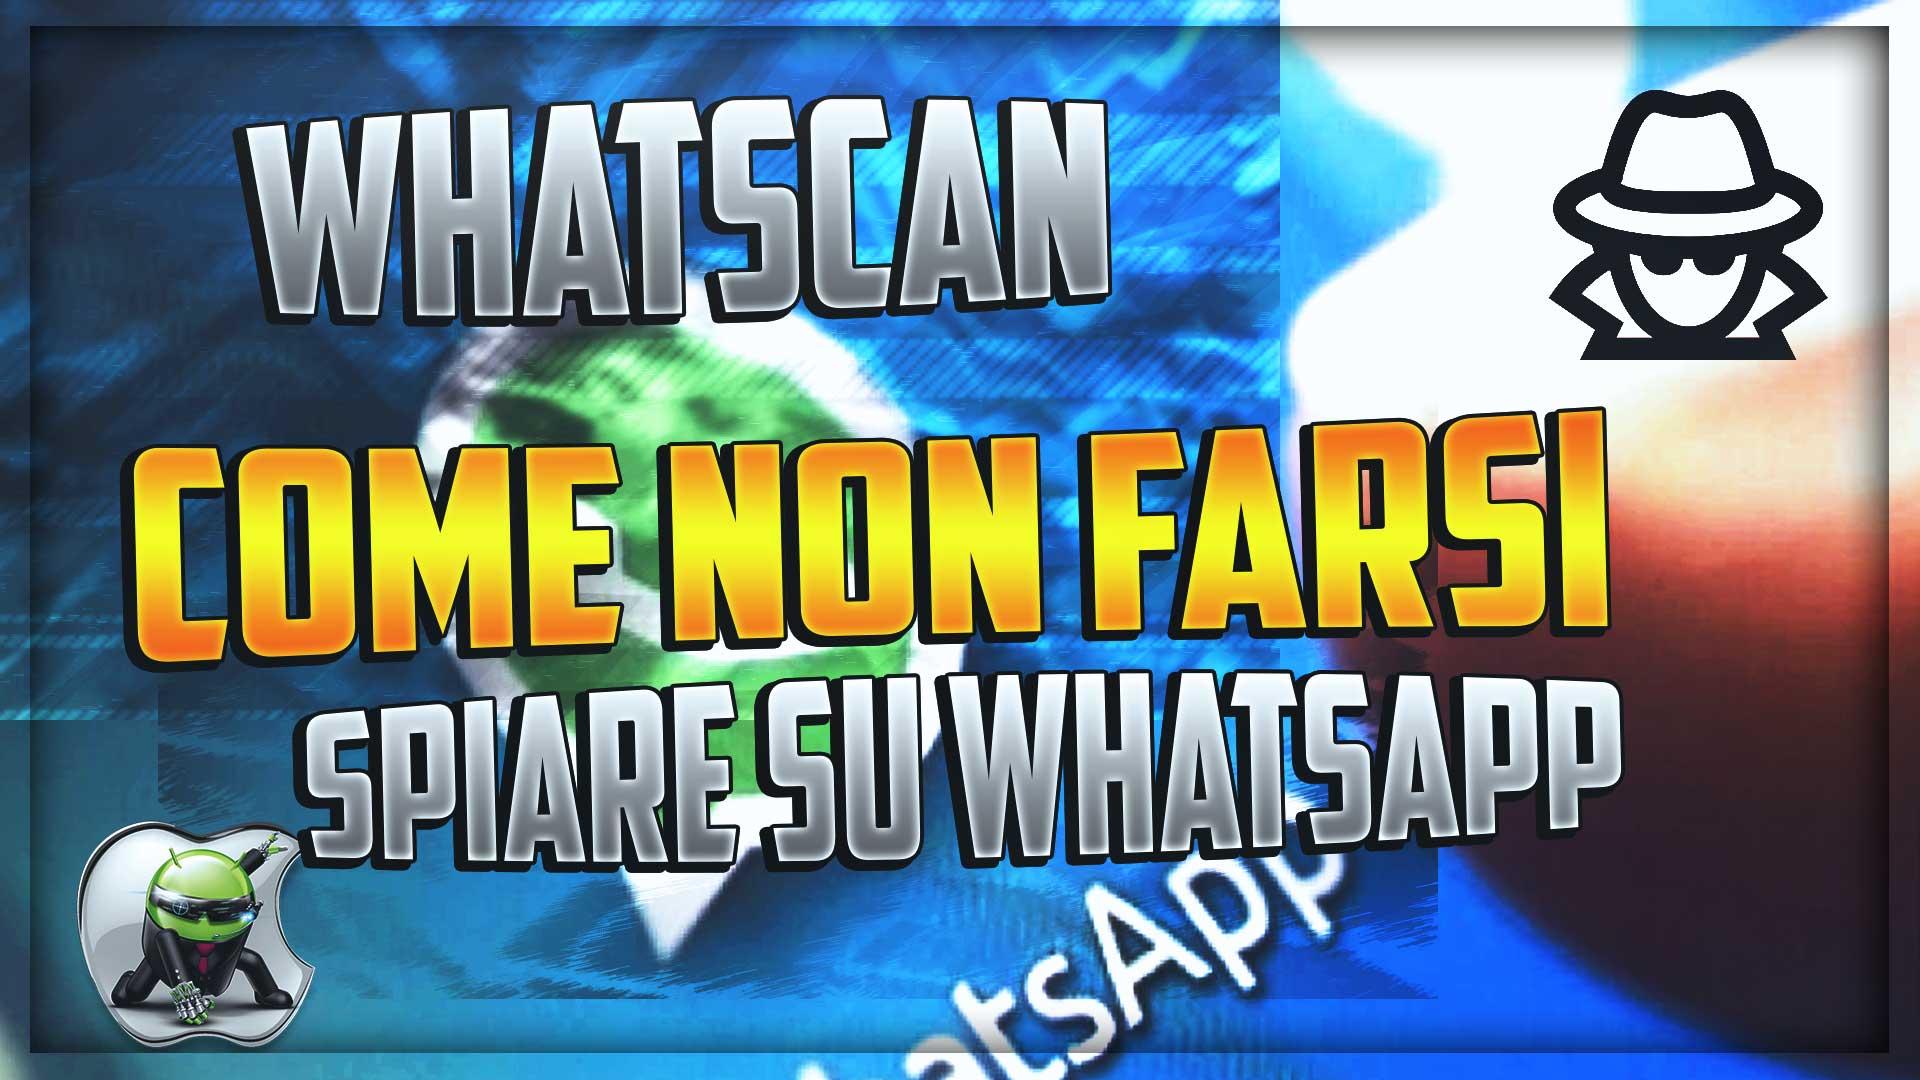 whatscan_app